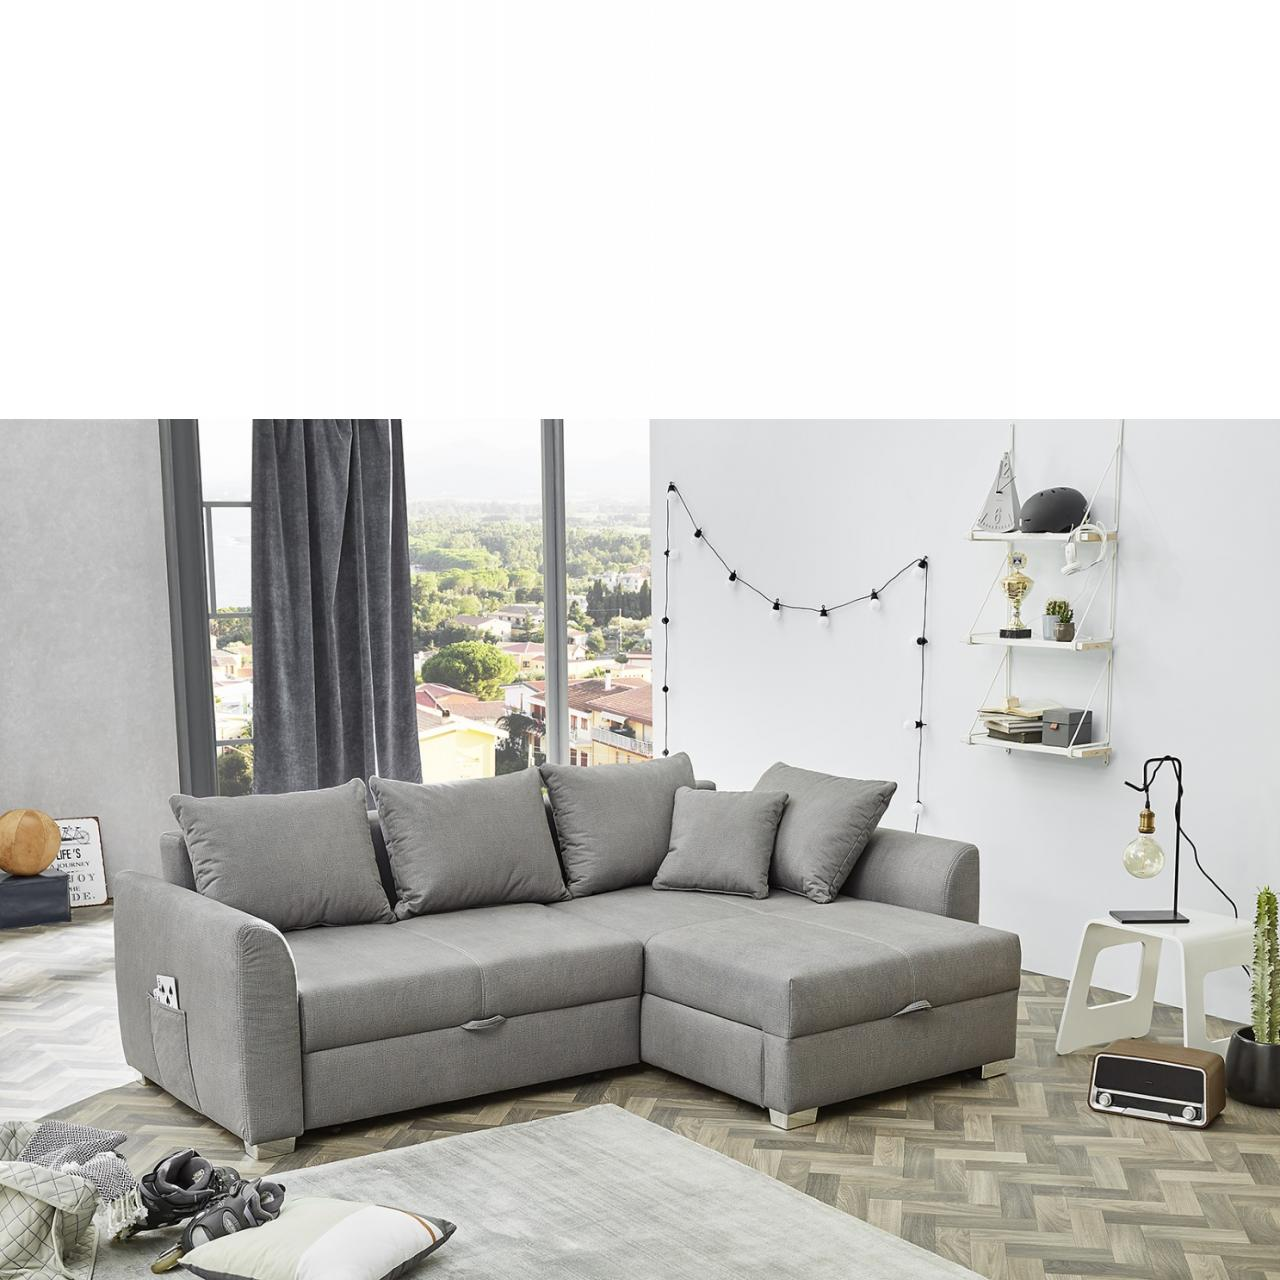 wohnlandschaft boomer grau mit schlaffunktion inkl kissen. Black Bedroom Furniture Sets. Home Design Ideas